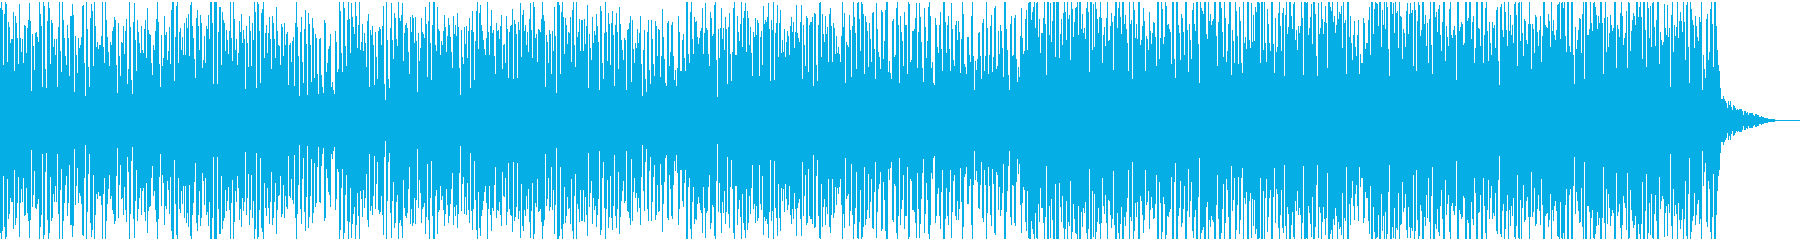 News25 Short16bit48kの再生済みの波形